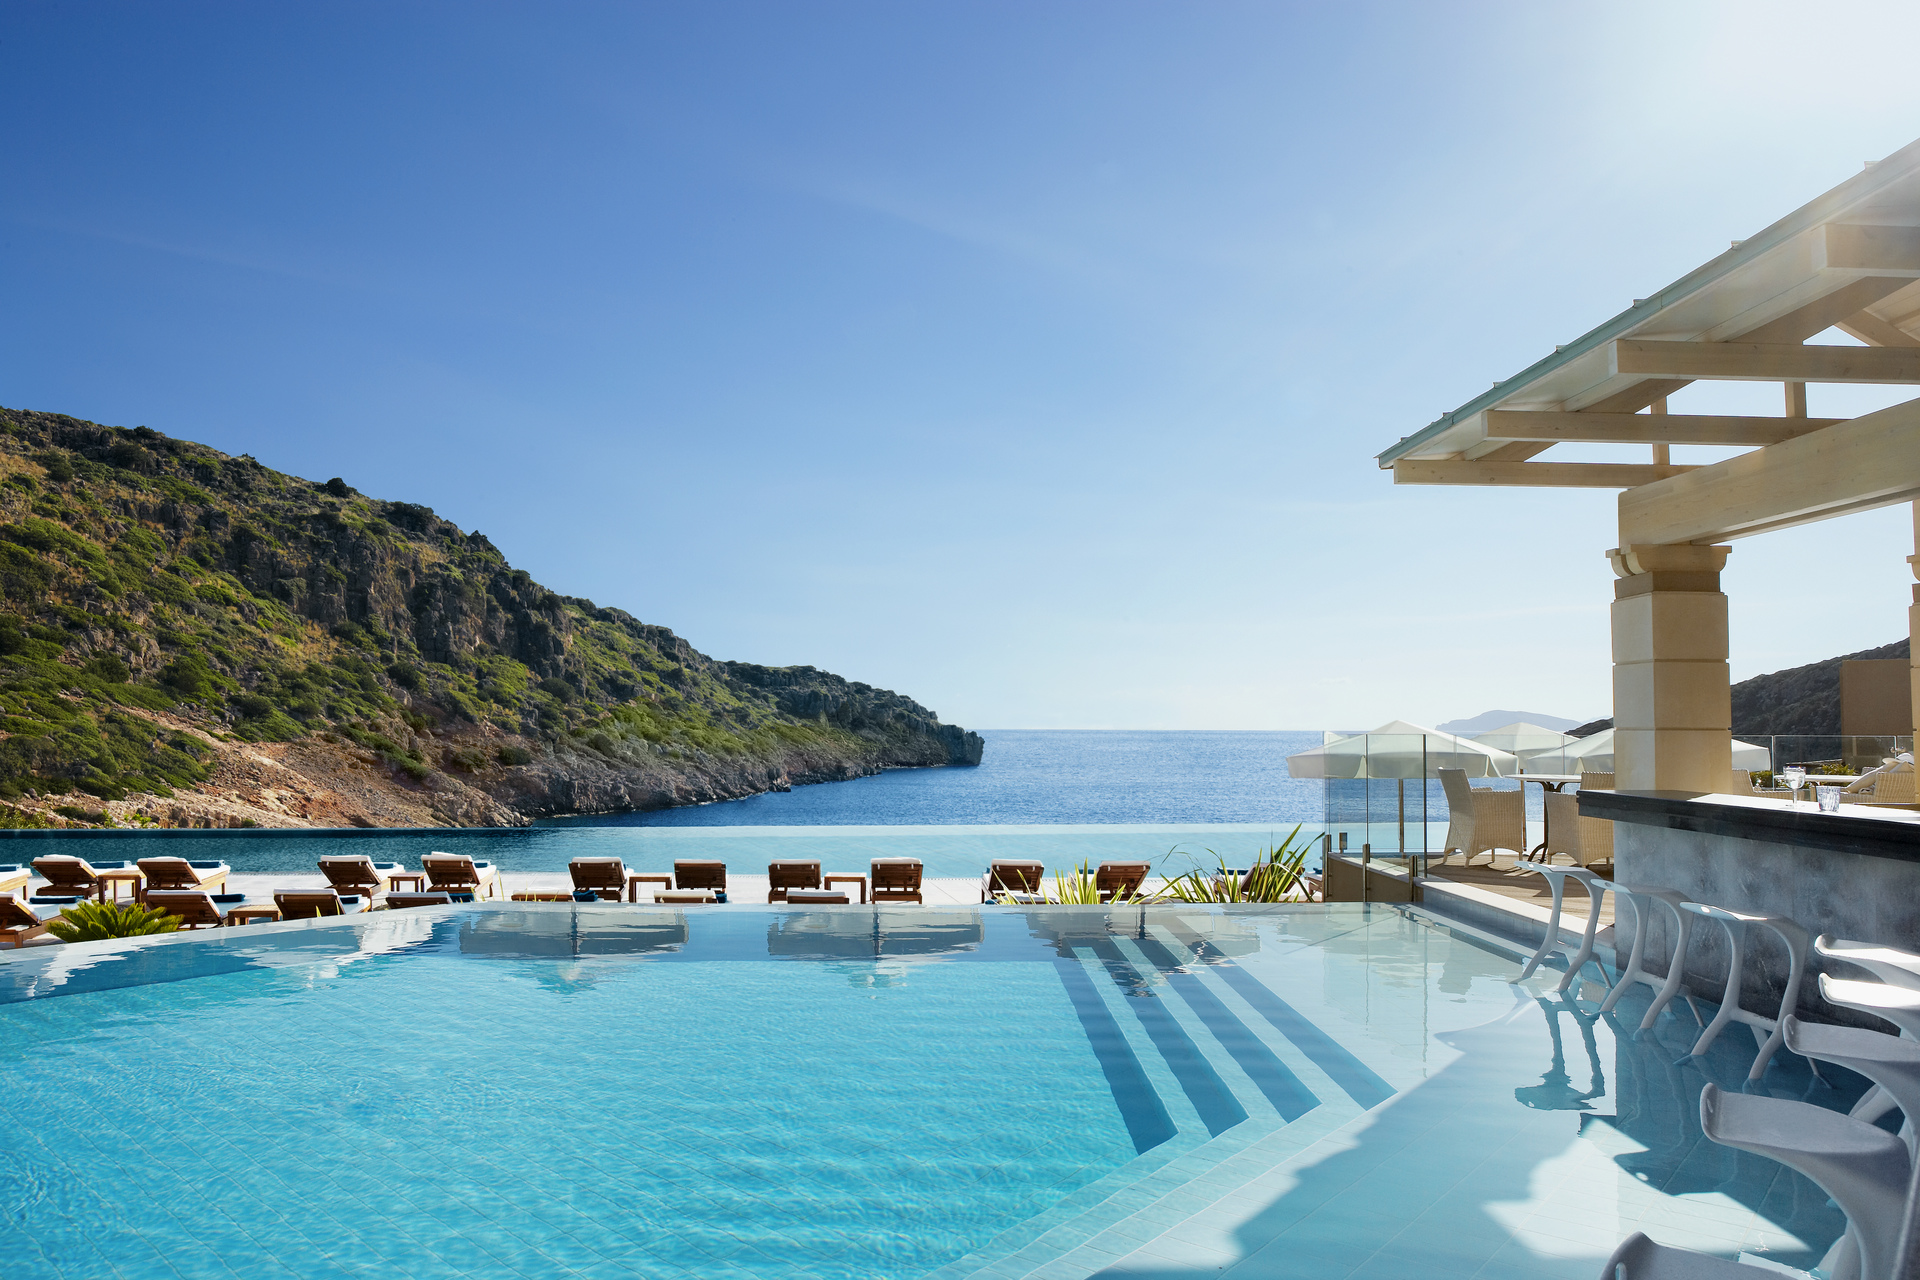 Daois Cove - Traumhafter Ausblick aufs Meer vom Pool aus